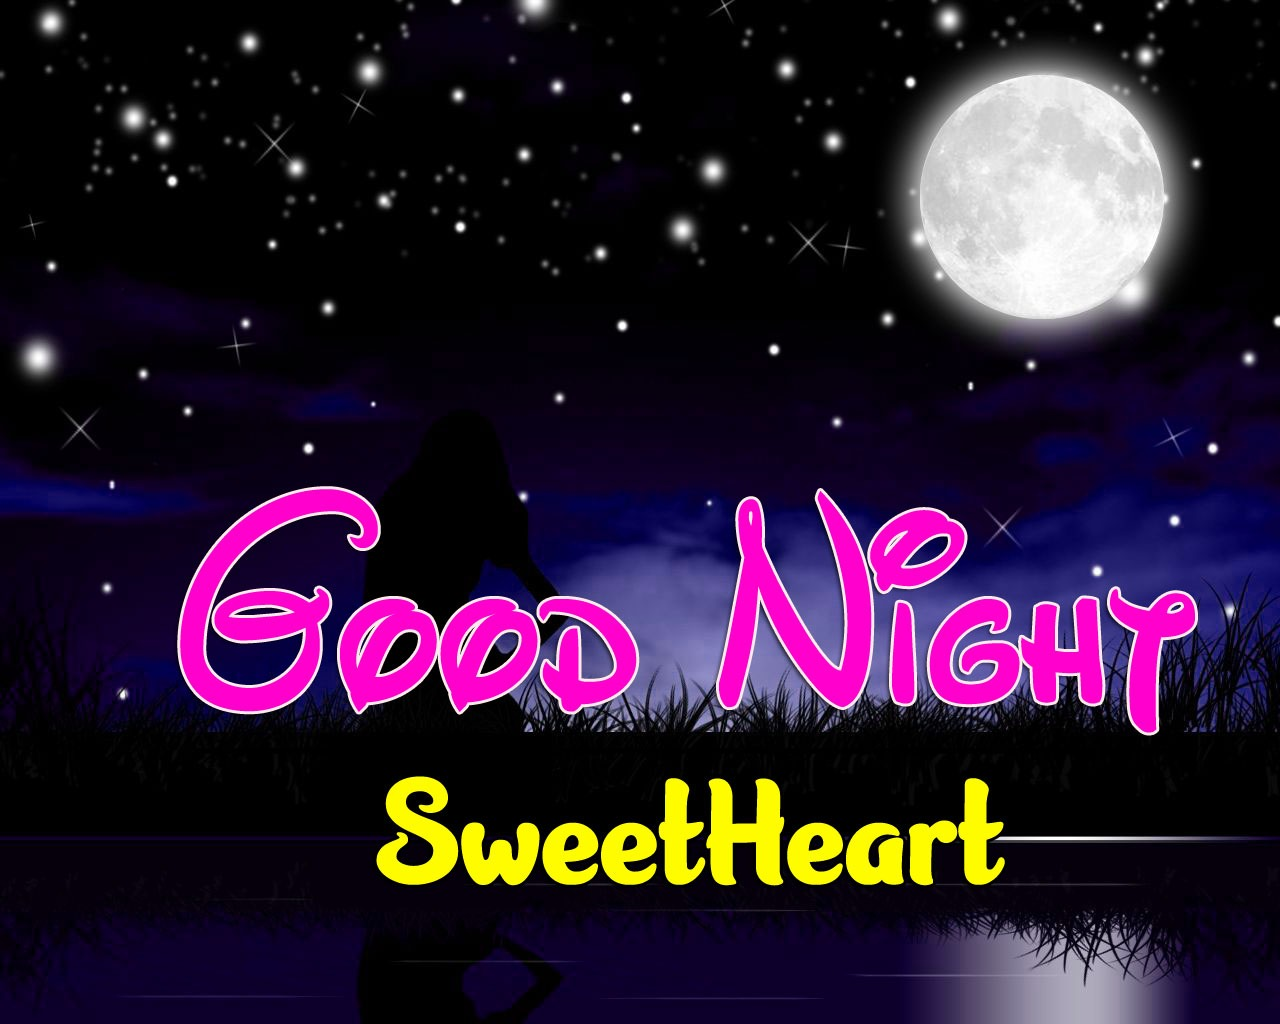 Free Girlfriend Good Night Wishes Wallpaper For Sweet Heart